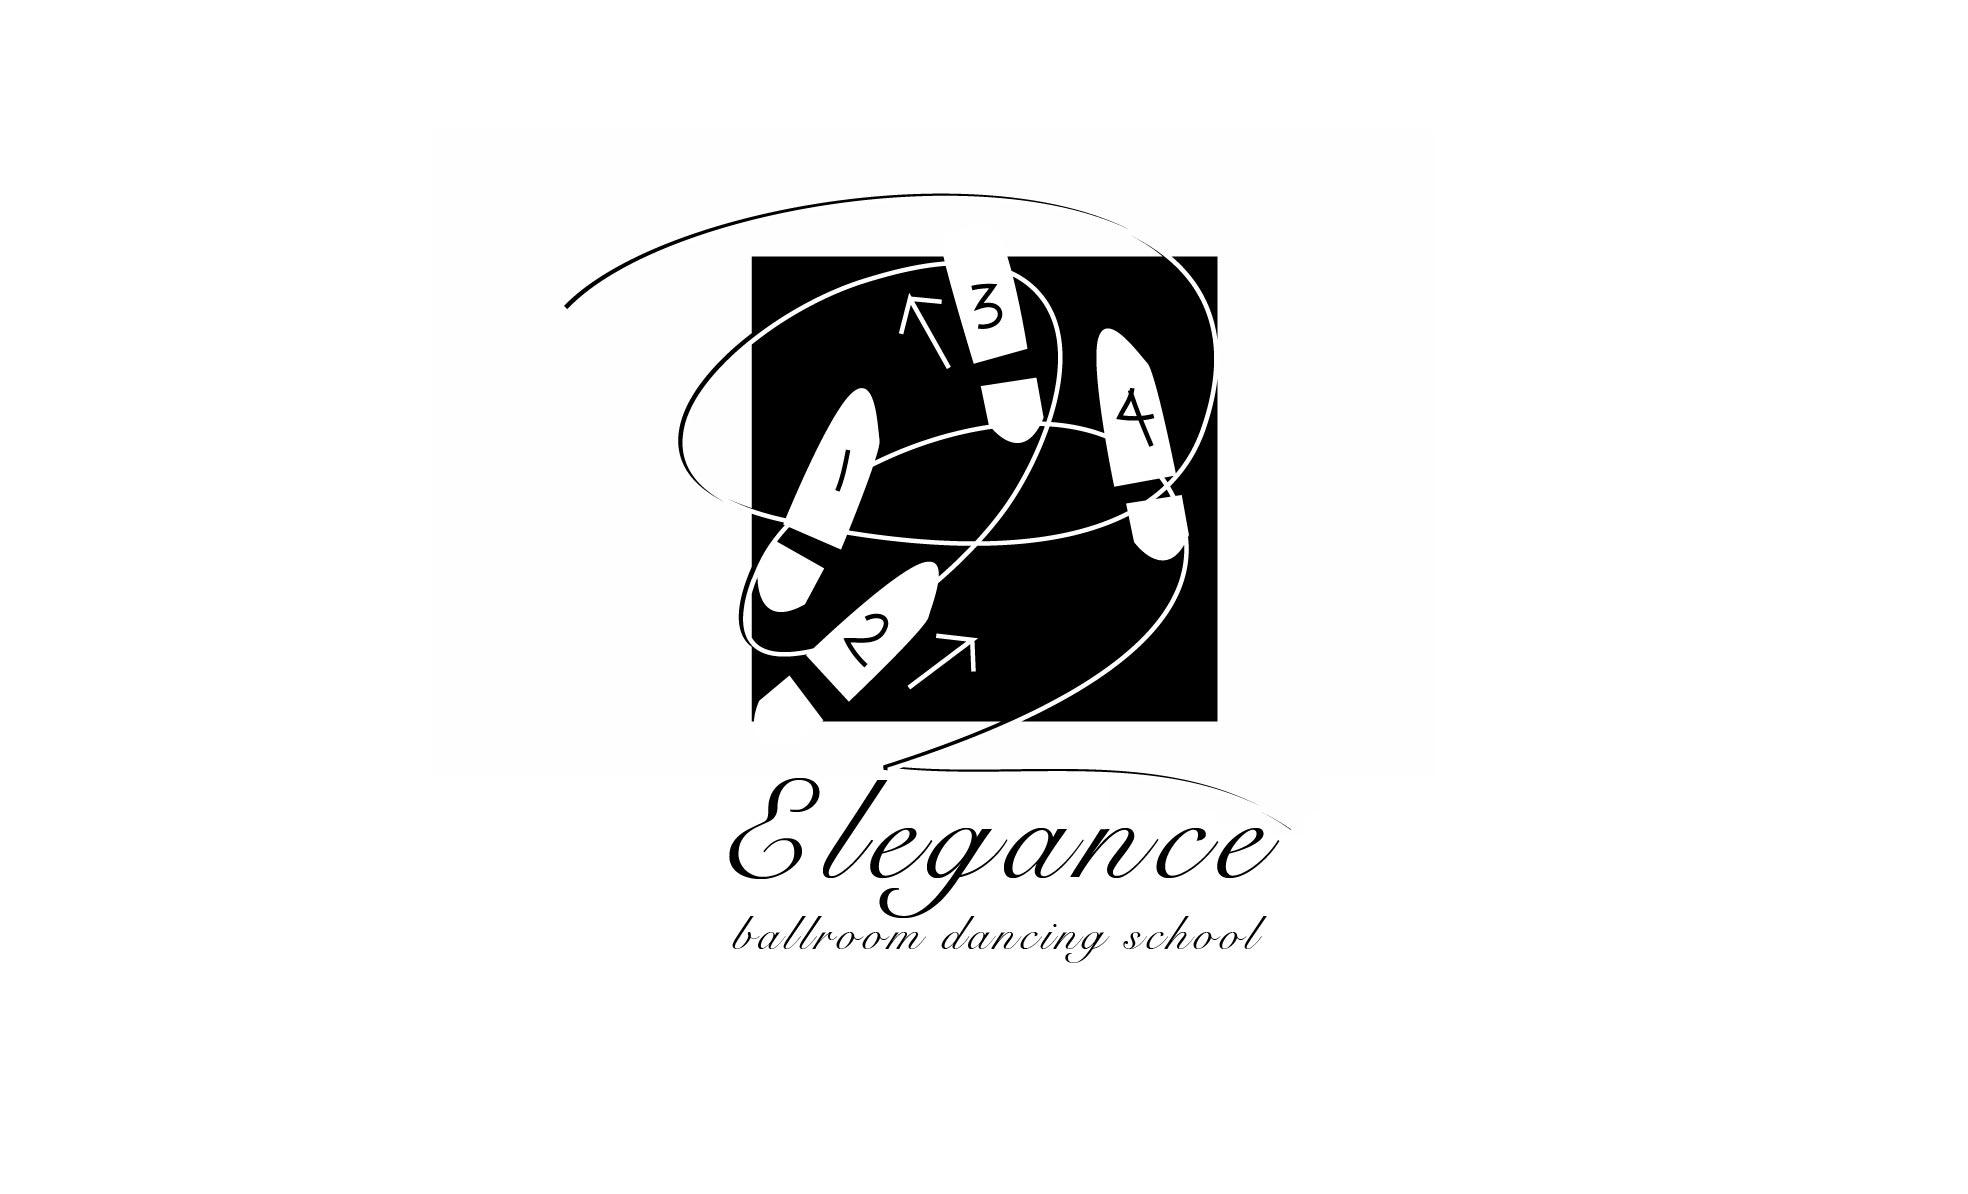 elegance-ballroom-dancing-school-logo-design-web5